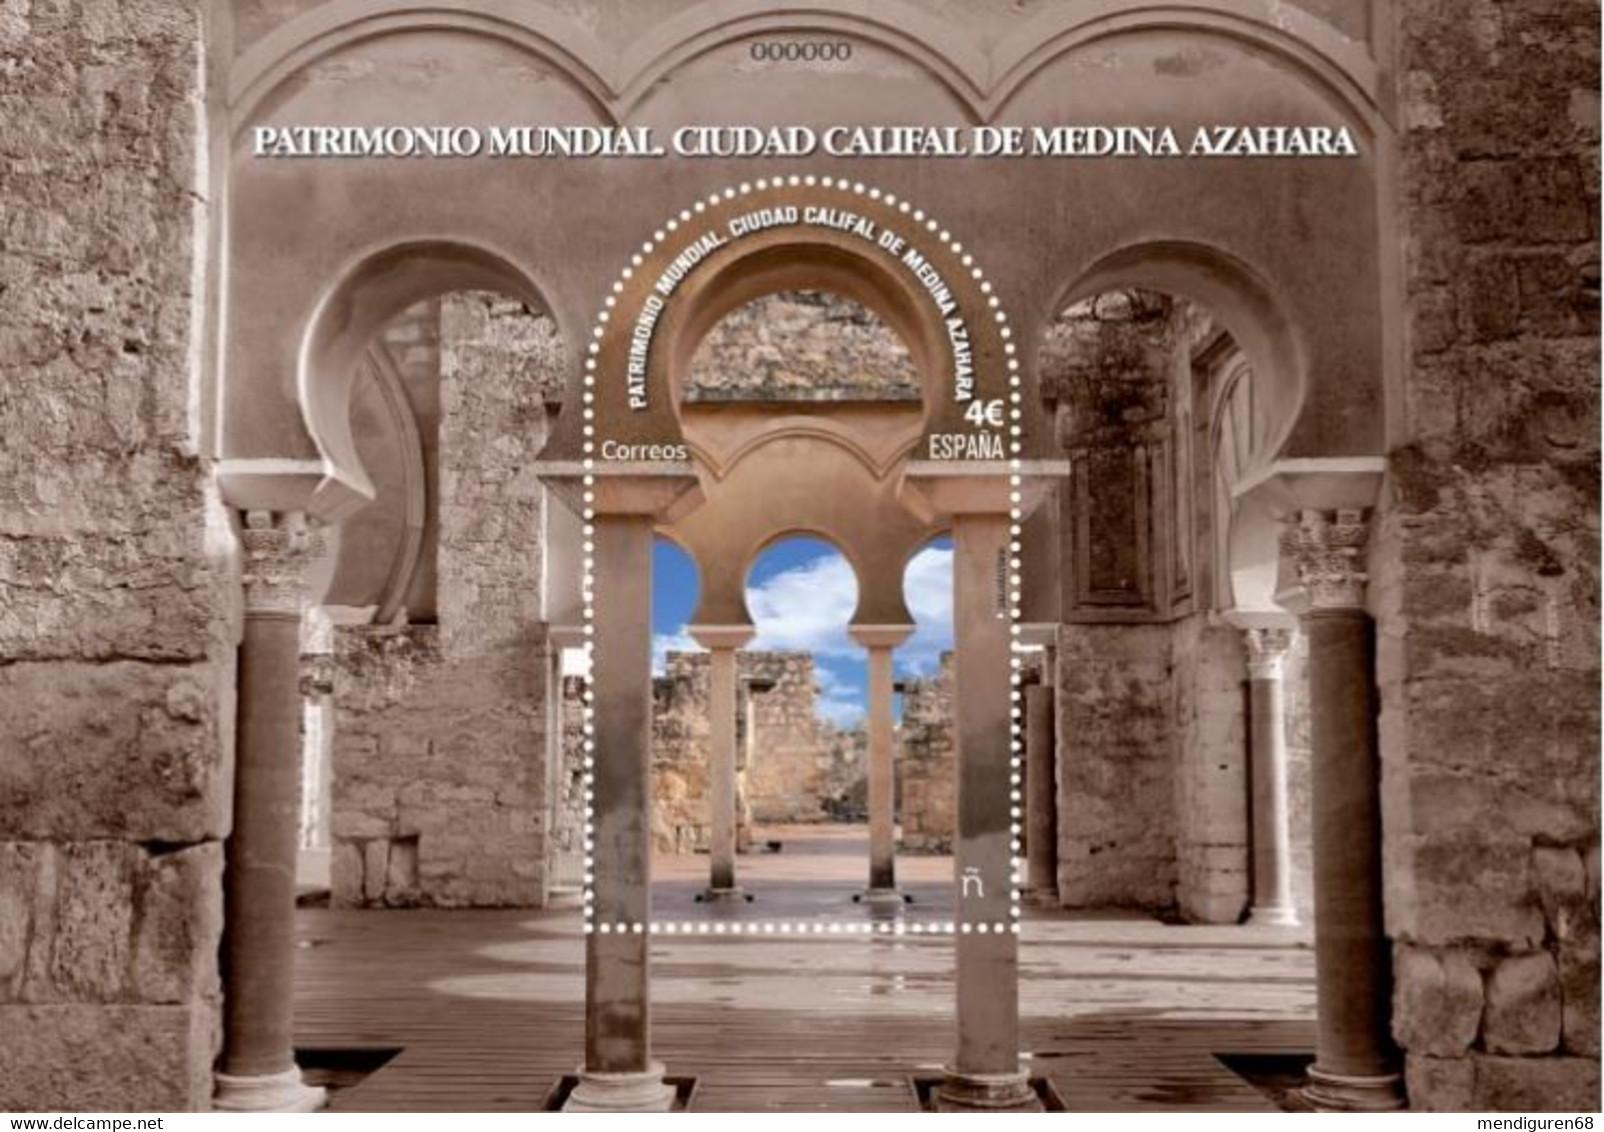 ESPAGNE SPANIEN SPAIN ESPAÑA 2020 WORLD HERITAGE: CALIFAL CITY MEDINA AZAHARA PATRIMONIO MNH ED HB5435 MI B5475 YT F517 - 2011-... Ongebruikt